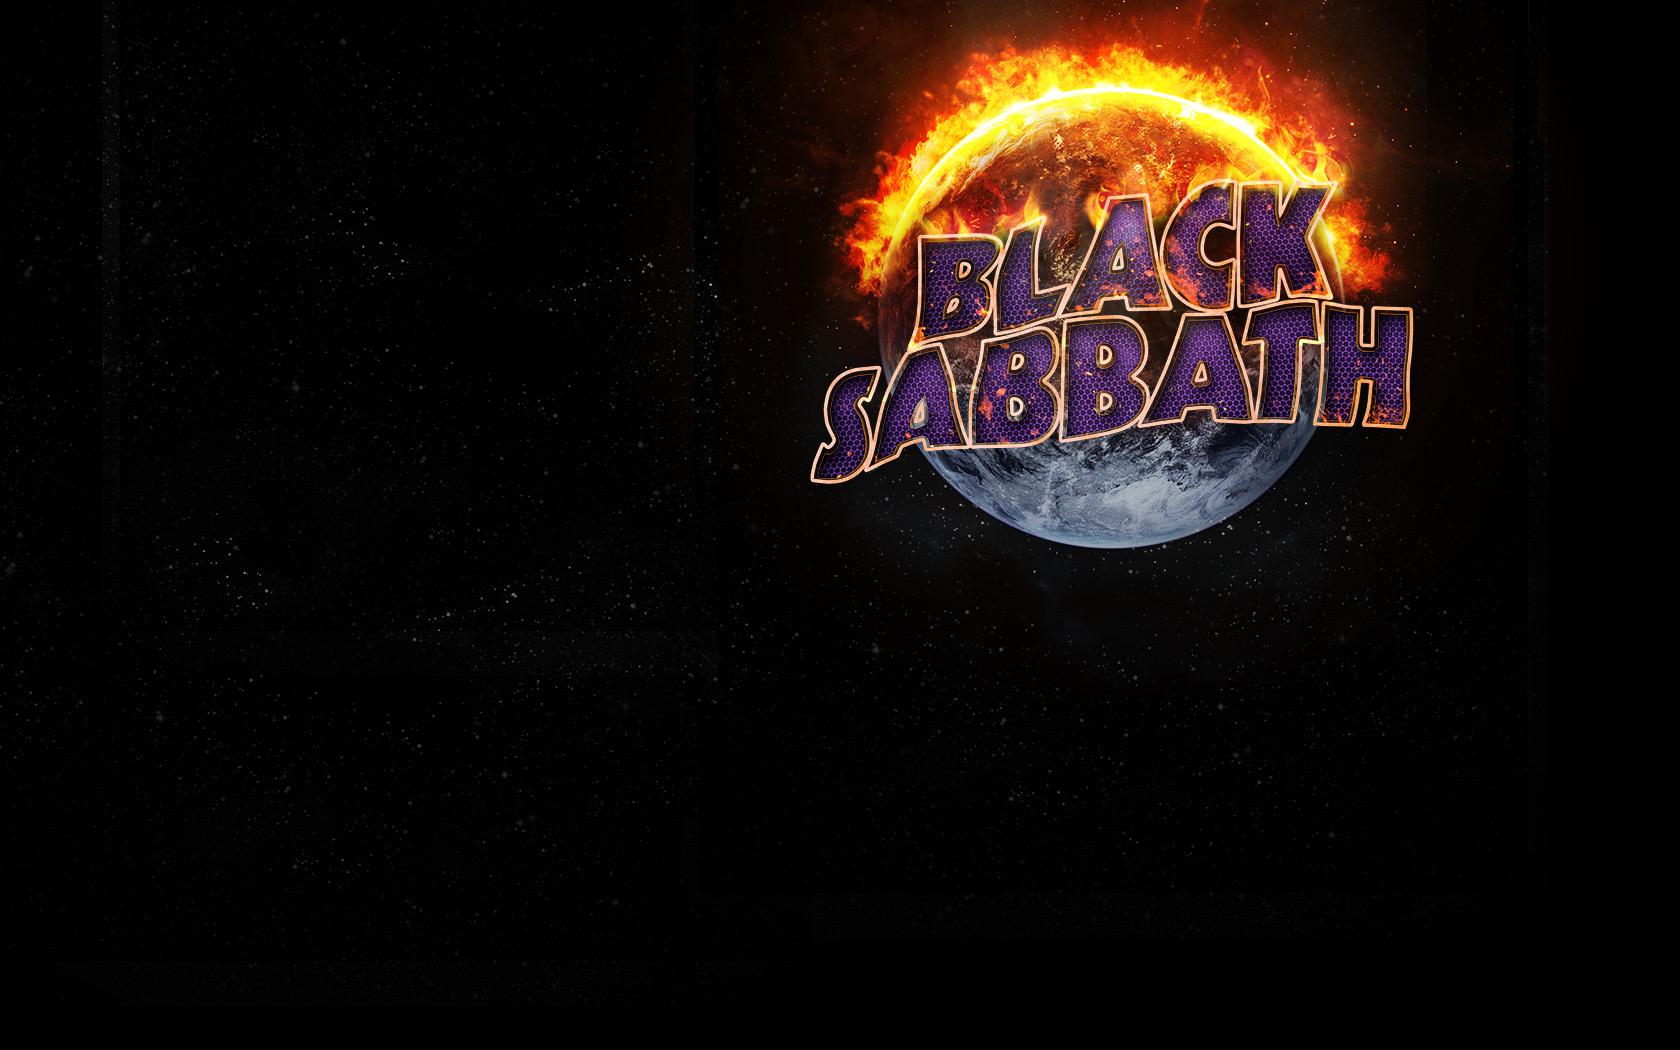 sabbath_theend7